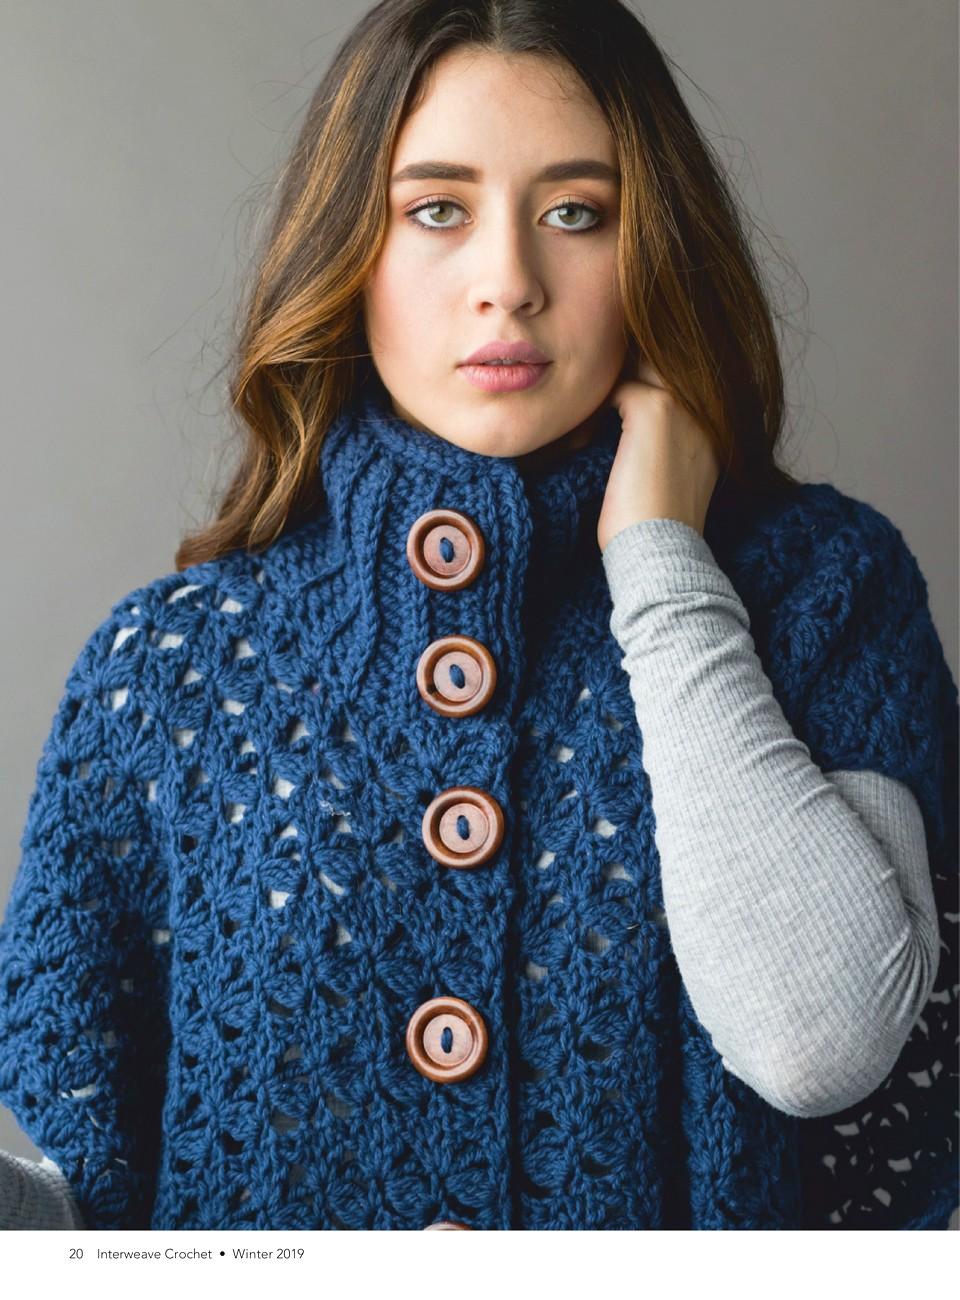 Interweave Crochet Winter 2019-21